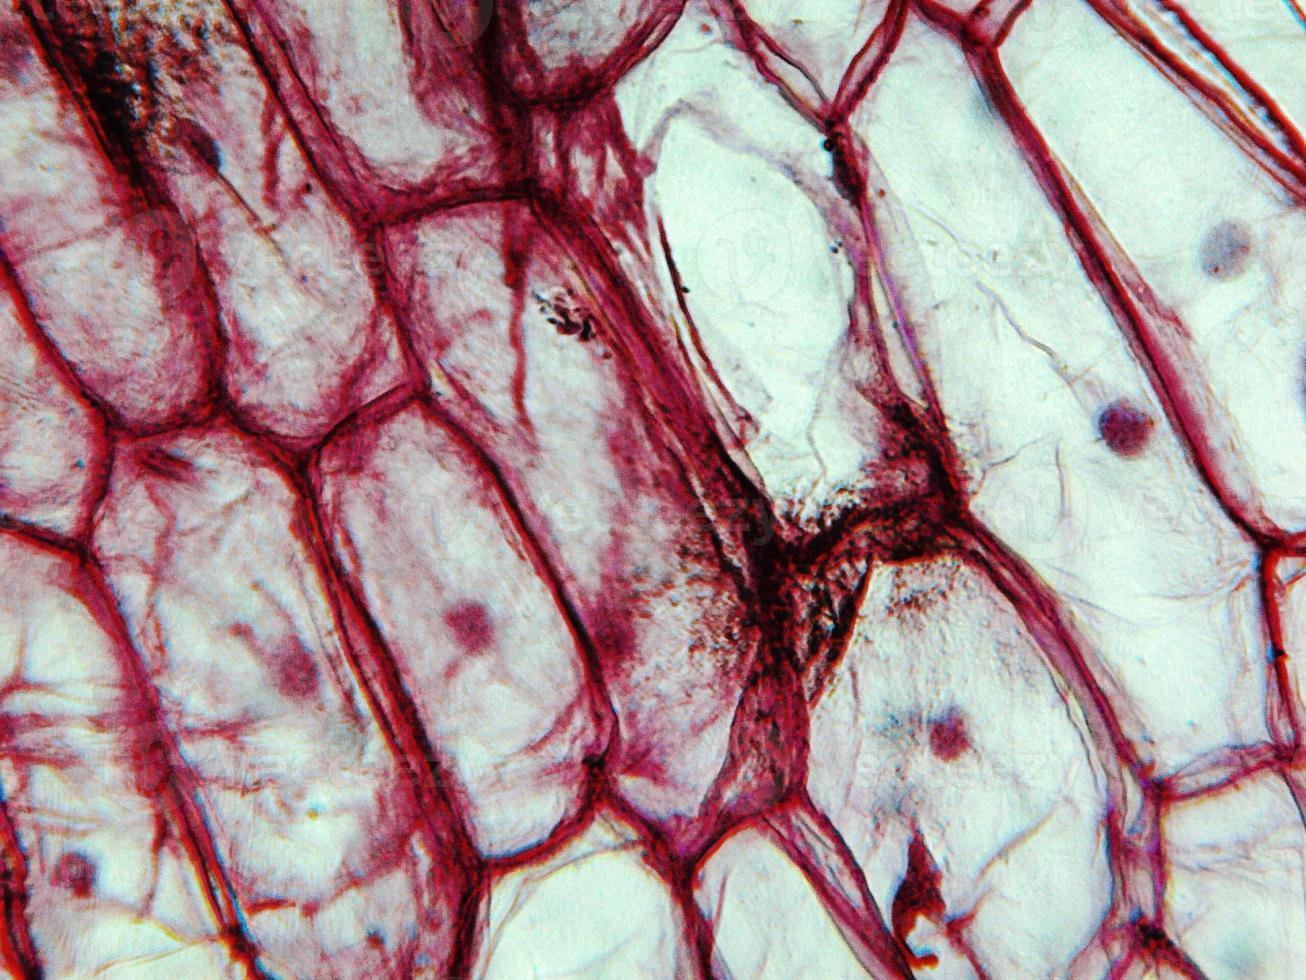 Onion epidermus micrograph photo